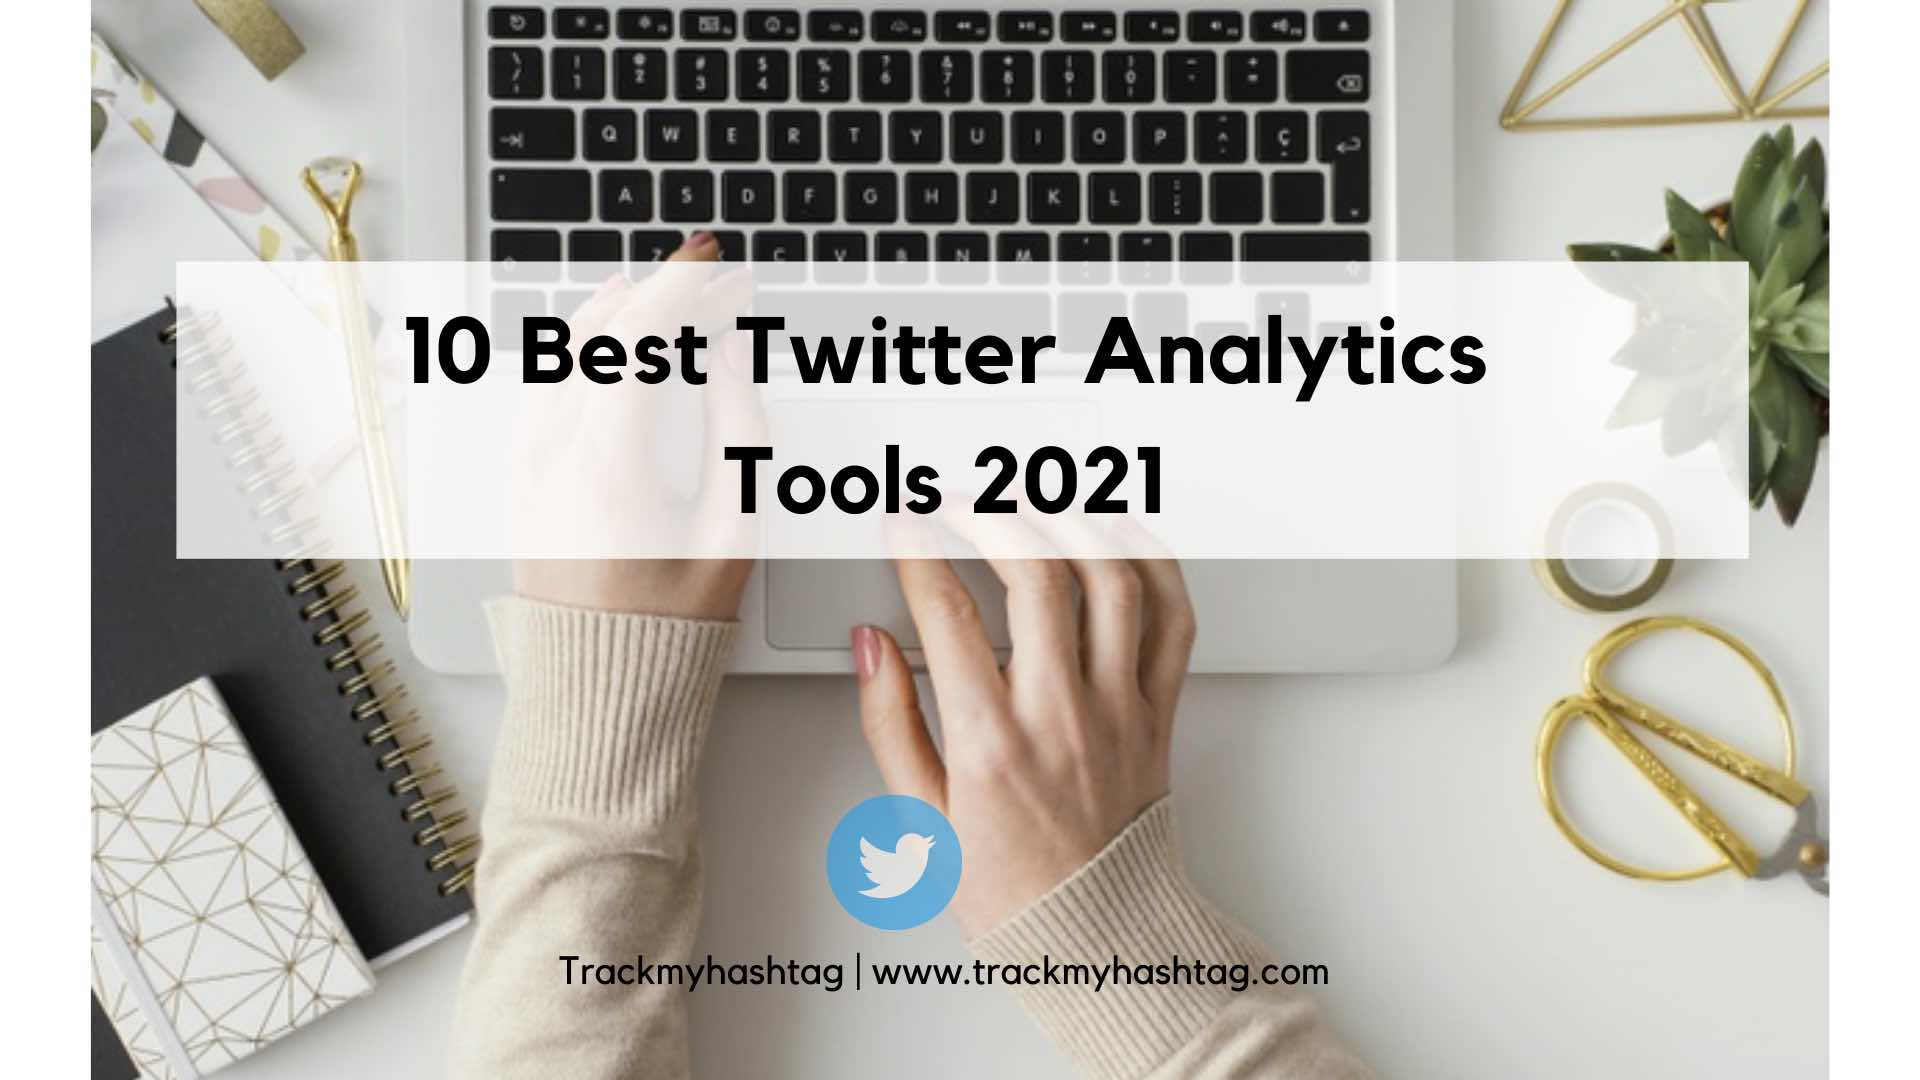 top 10 best Twitter analytics tools 2021, blog banner